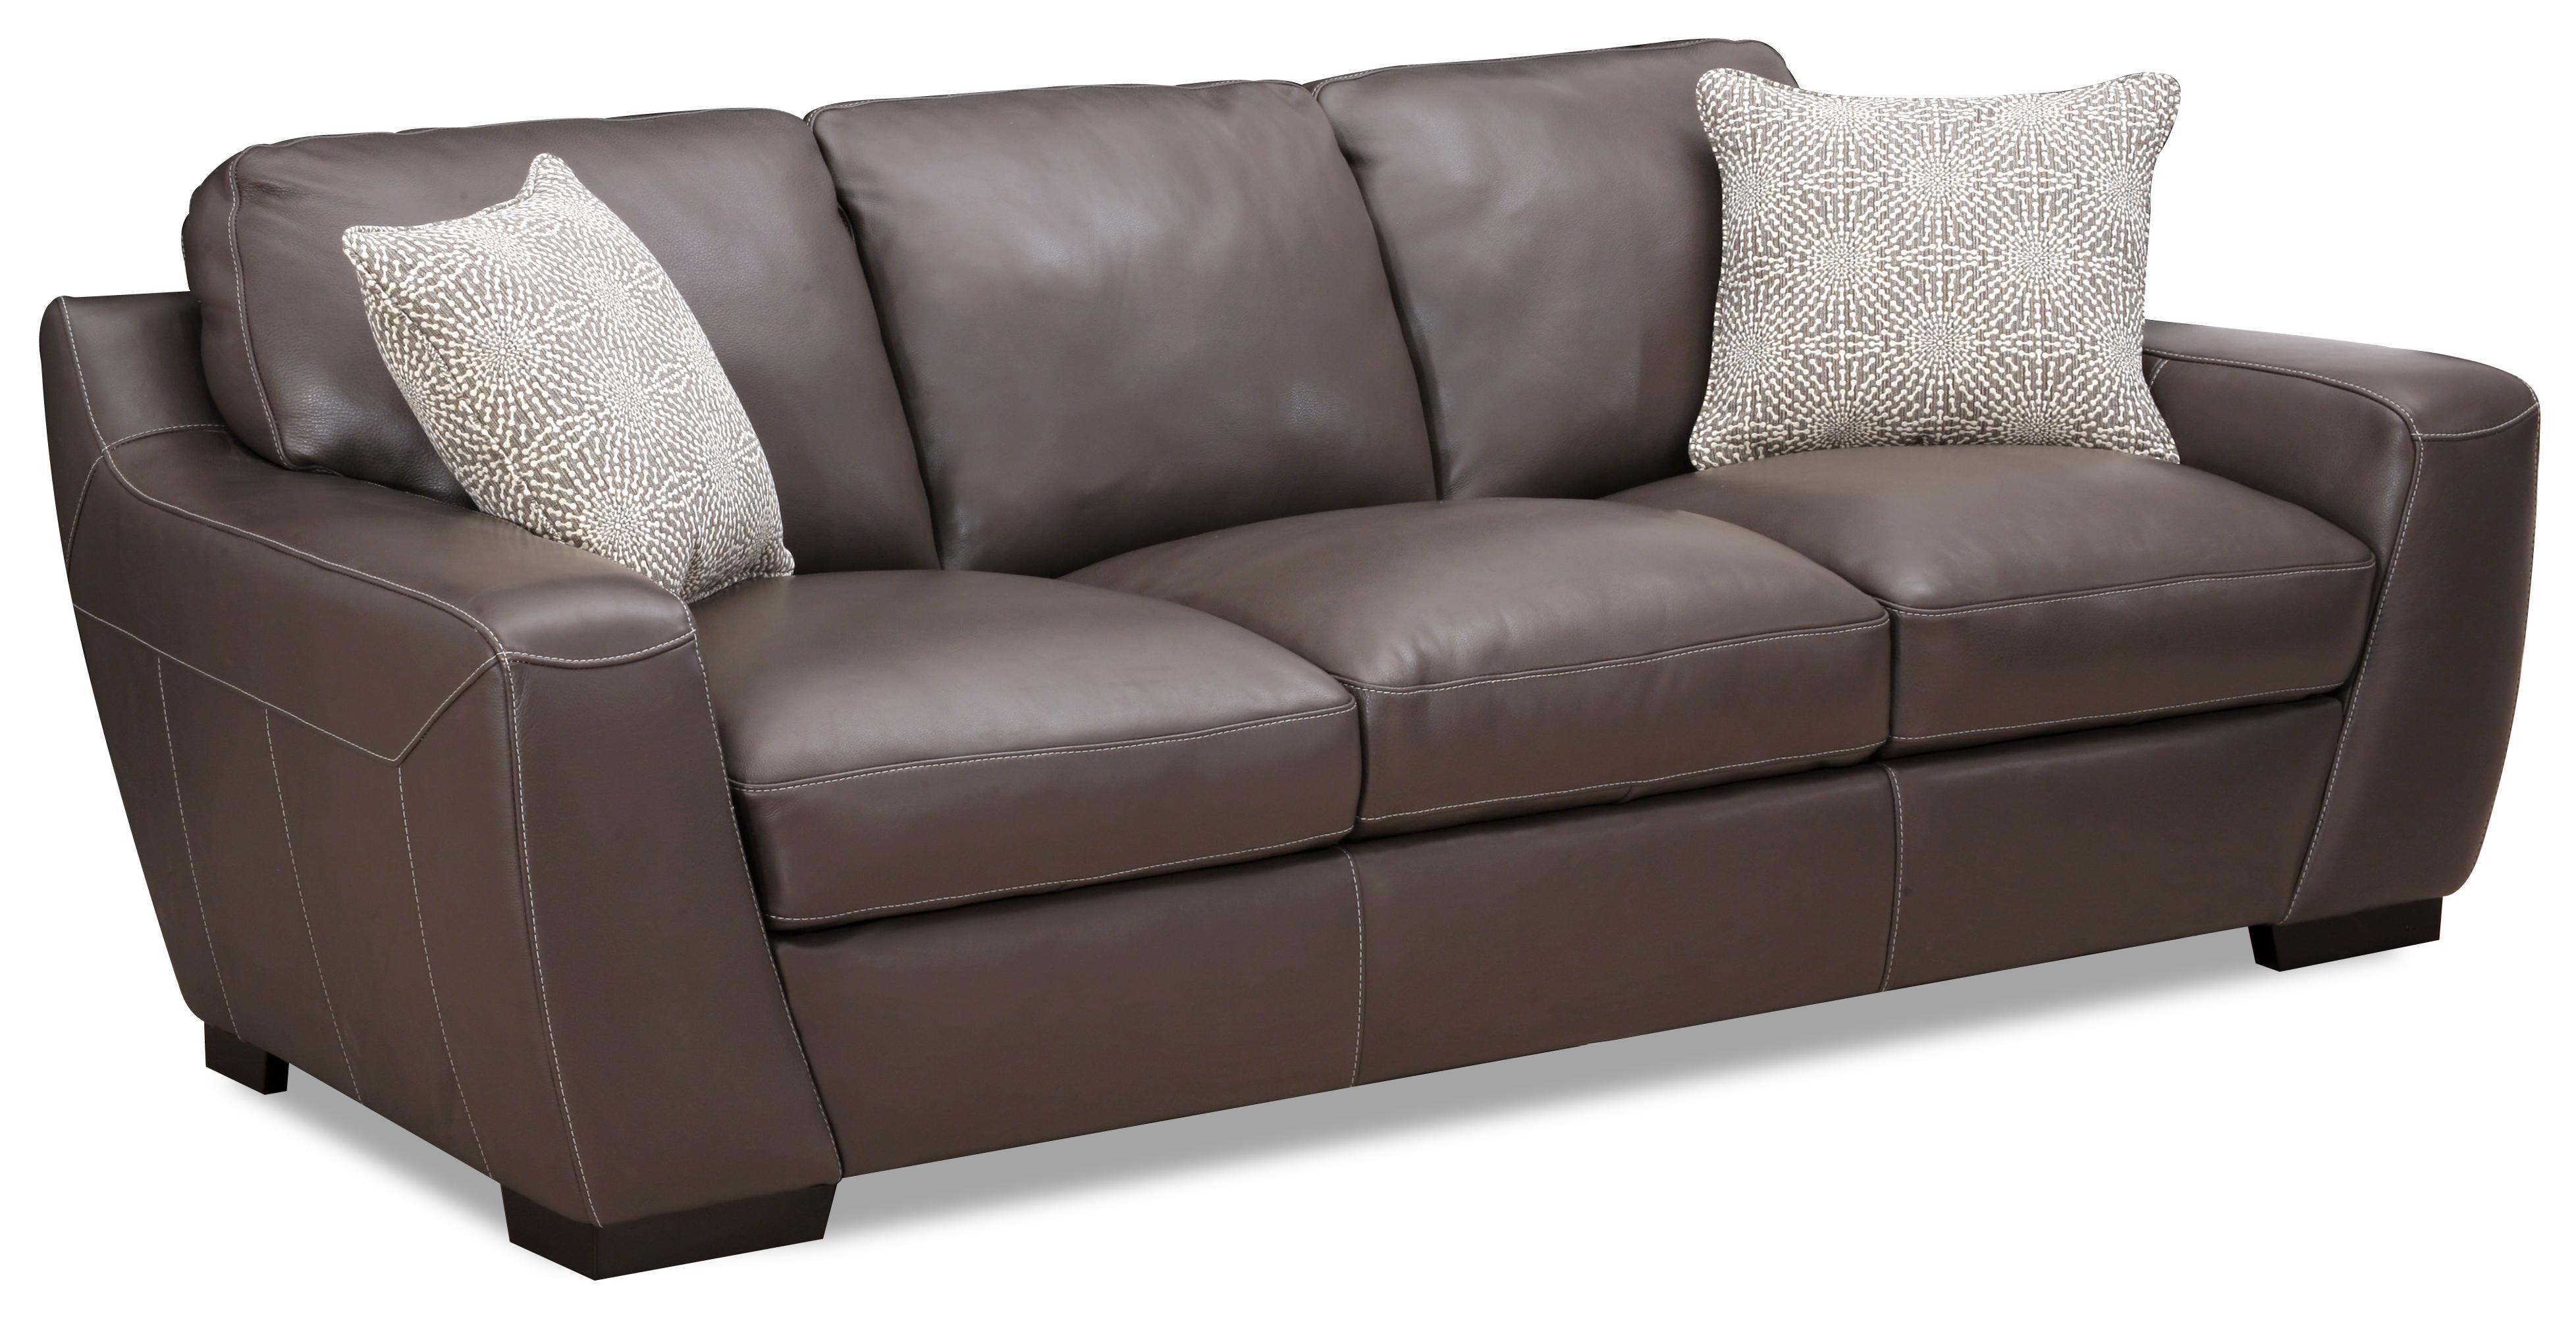 Alpha Stationary Leather Match Sofa by Simon Li at Dean Bosler's